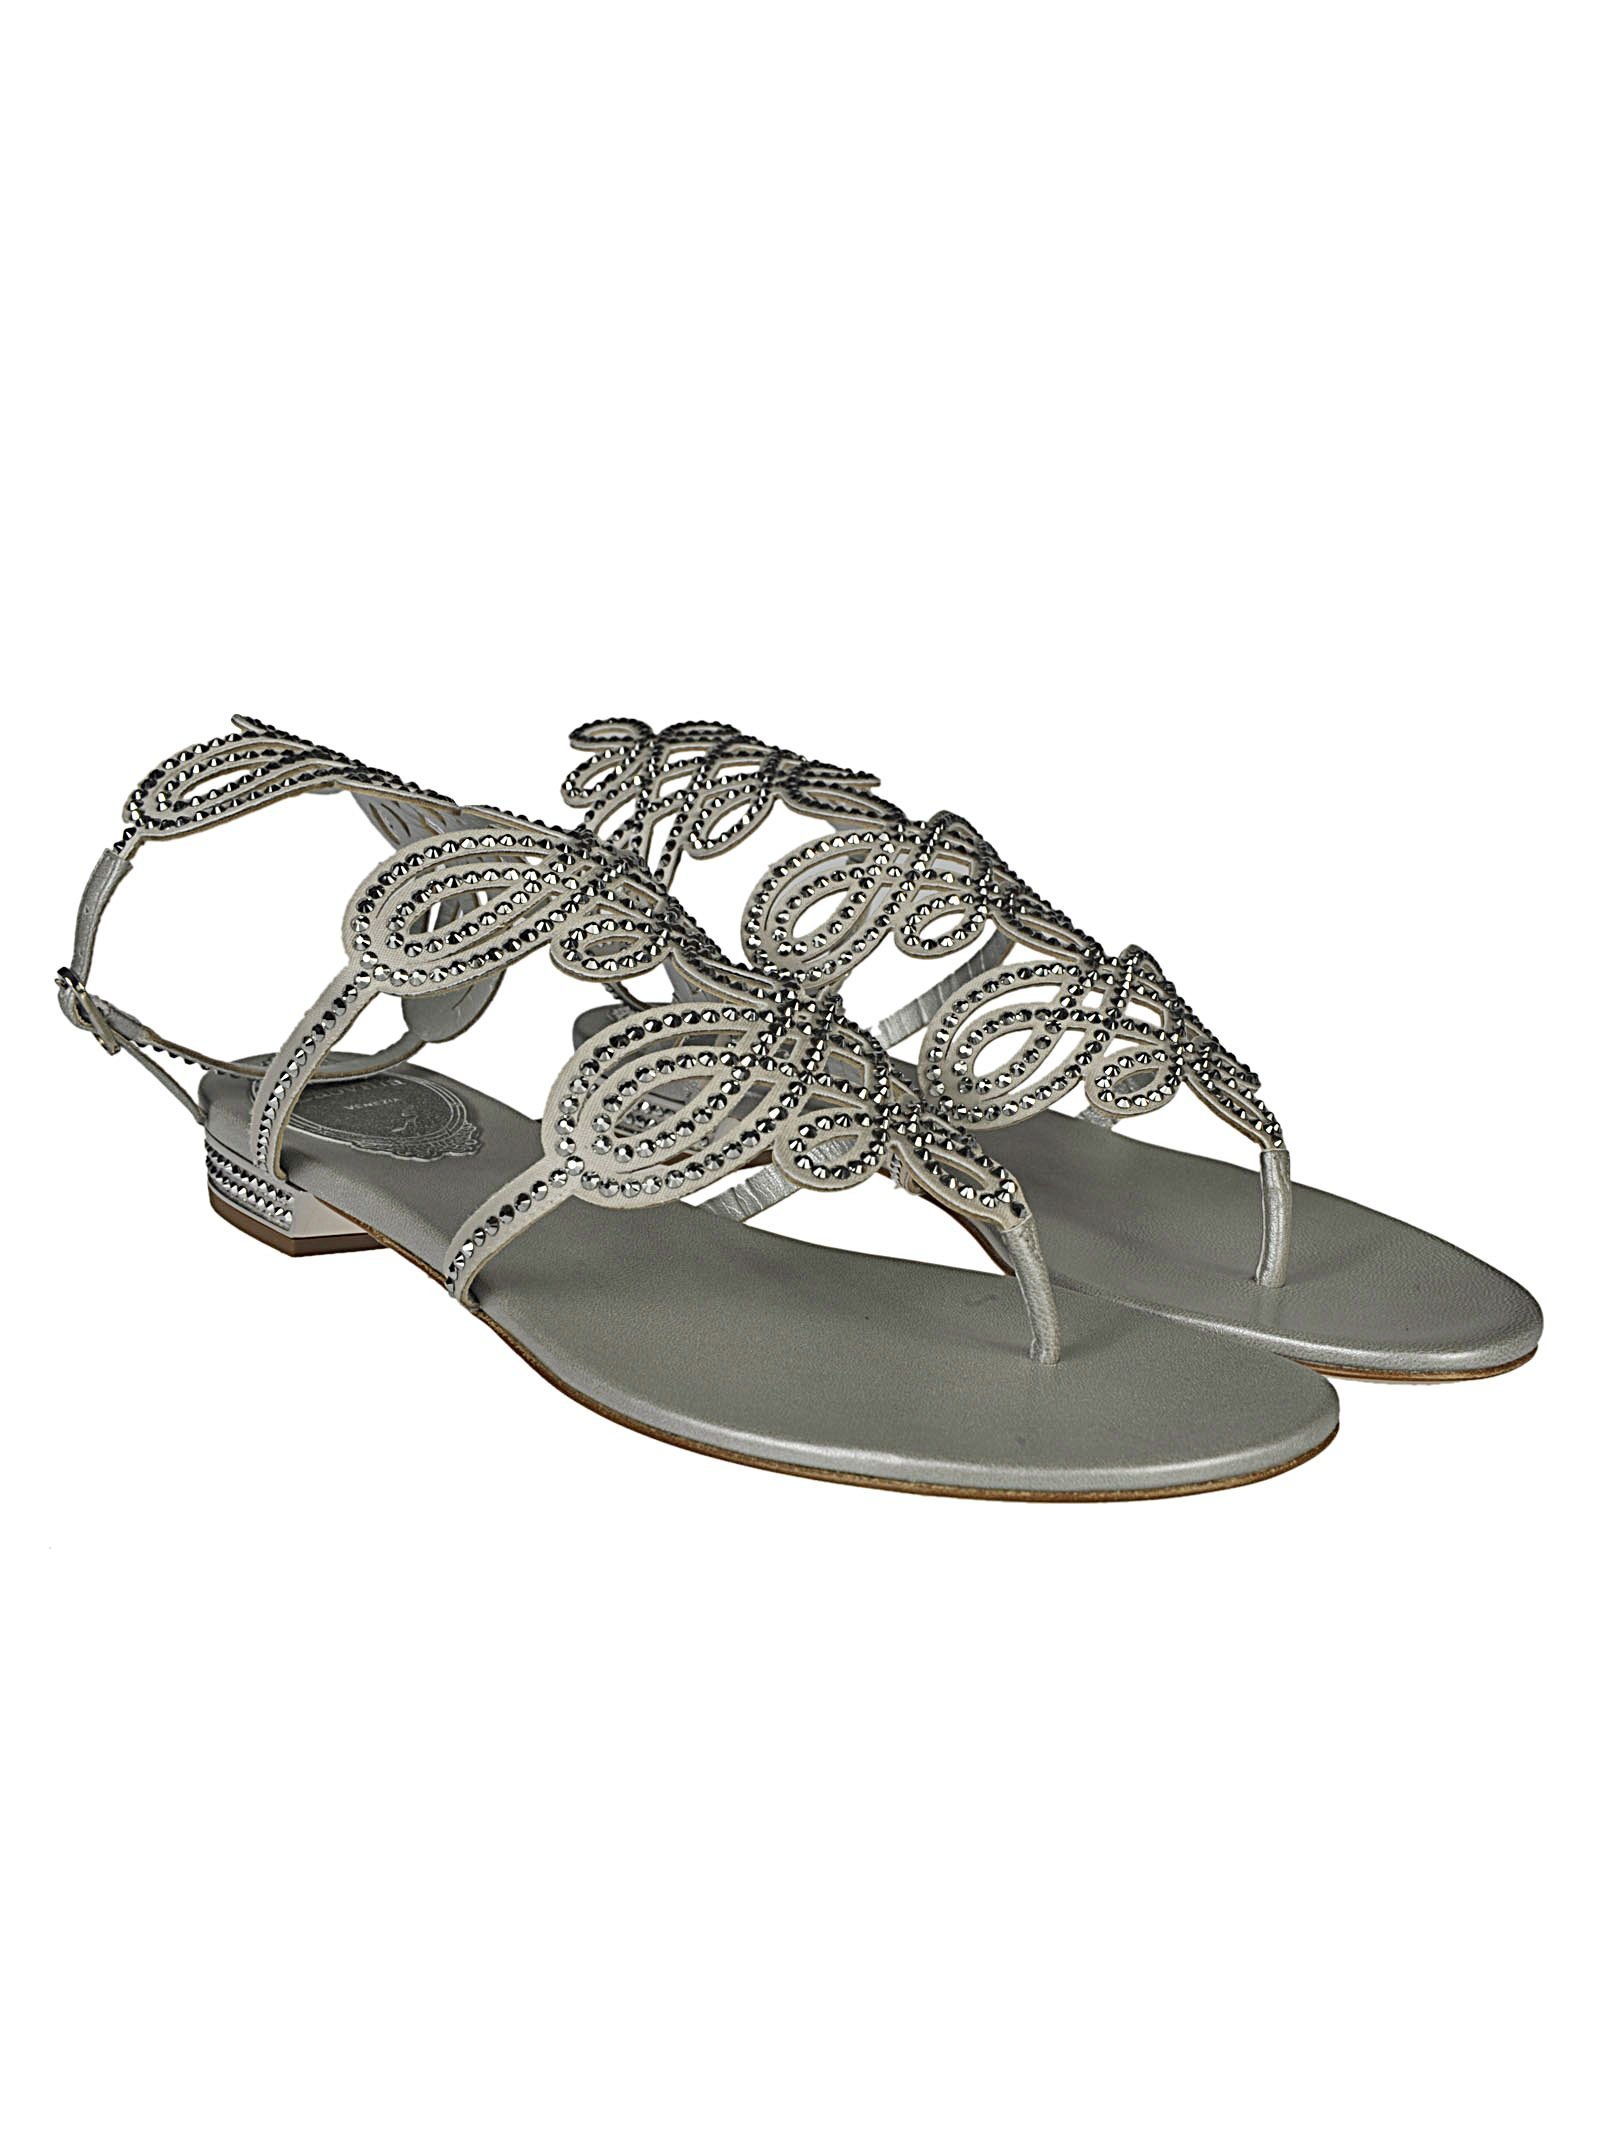 Rene Caovilla Thong Embellished Sandals